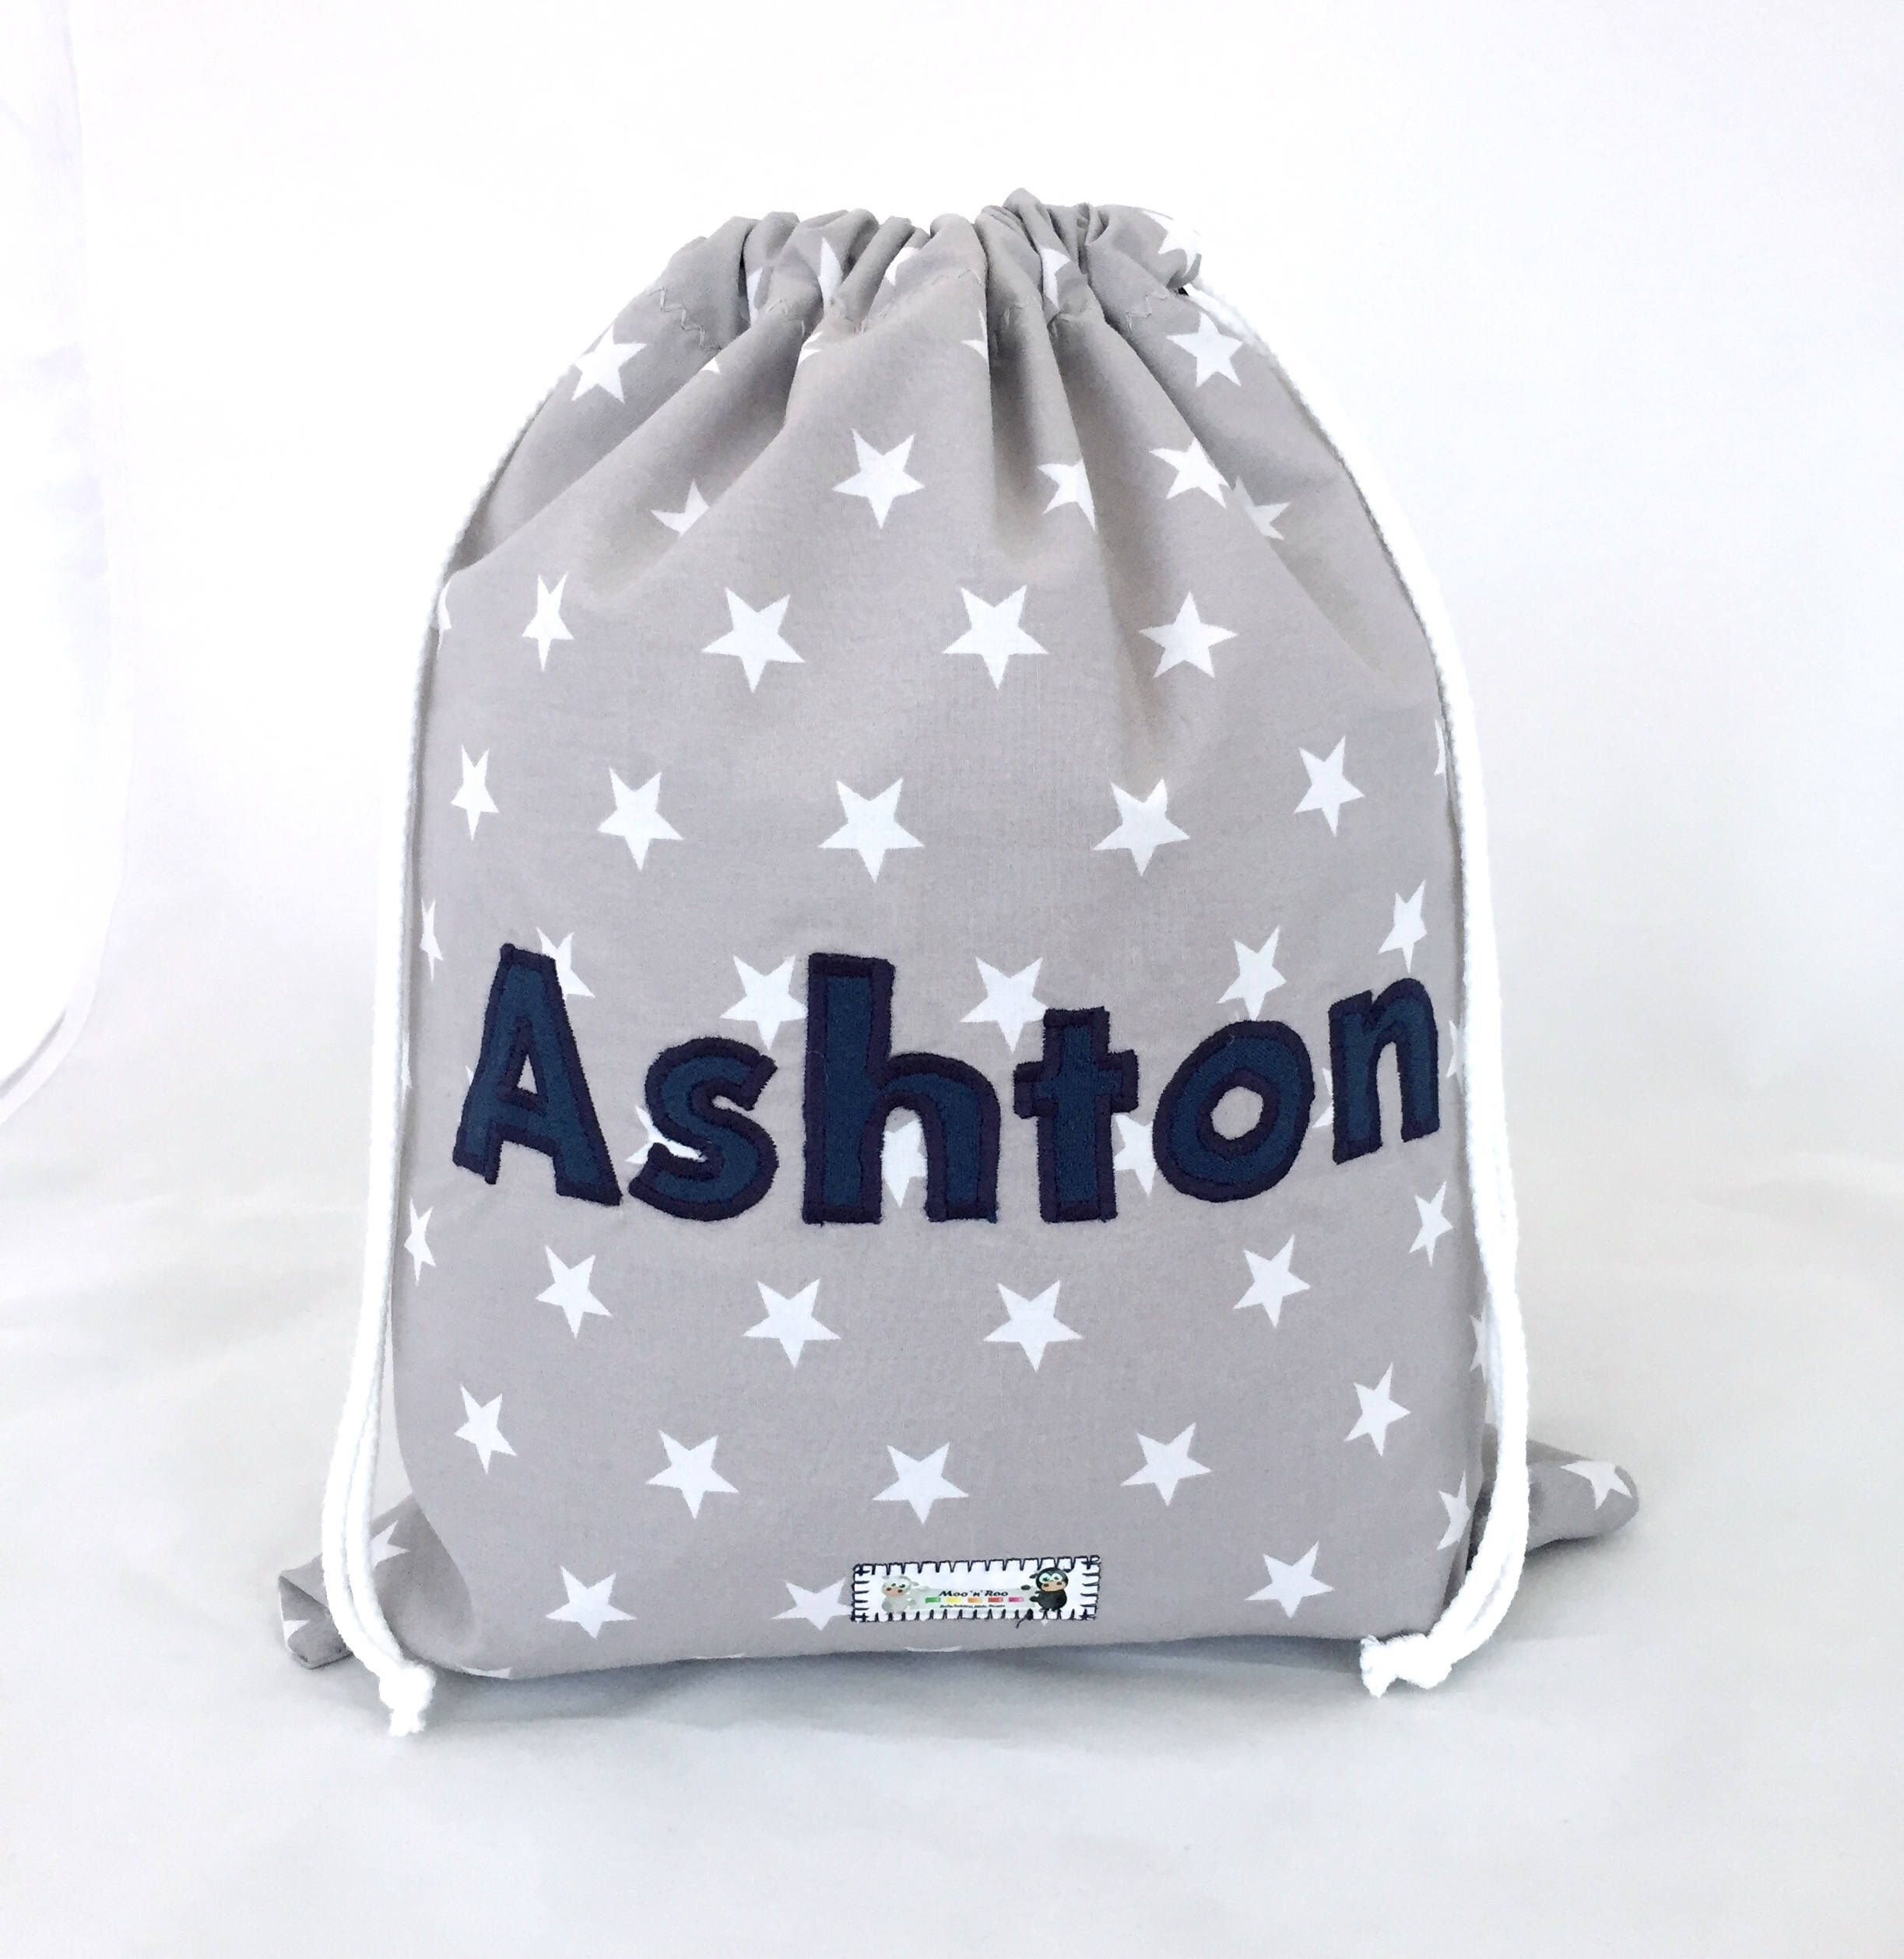 Kids Children S Personalised Drawstring Bag Boys Pe Swim